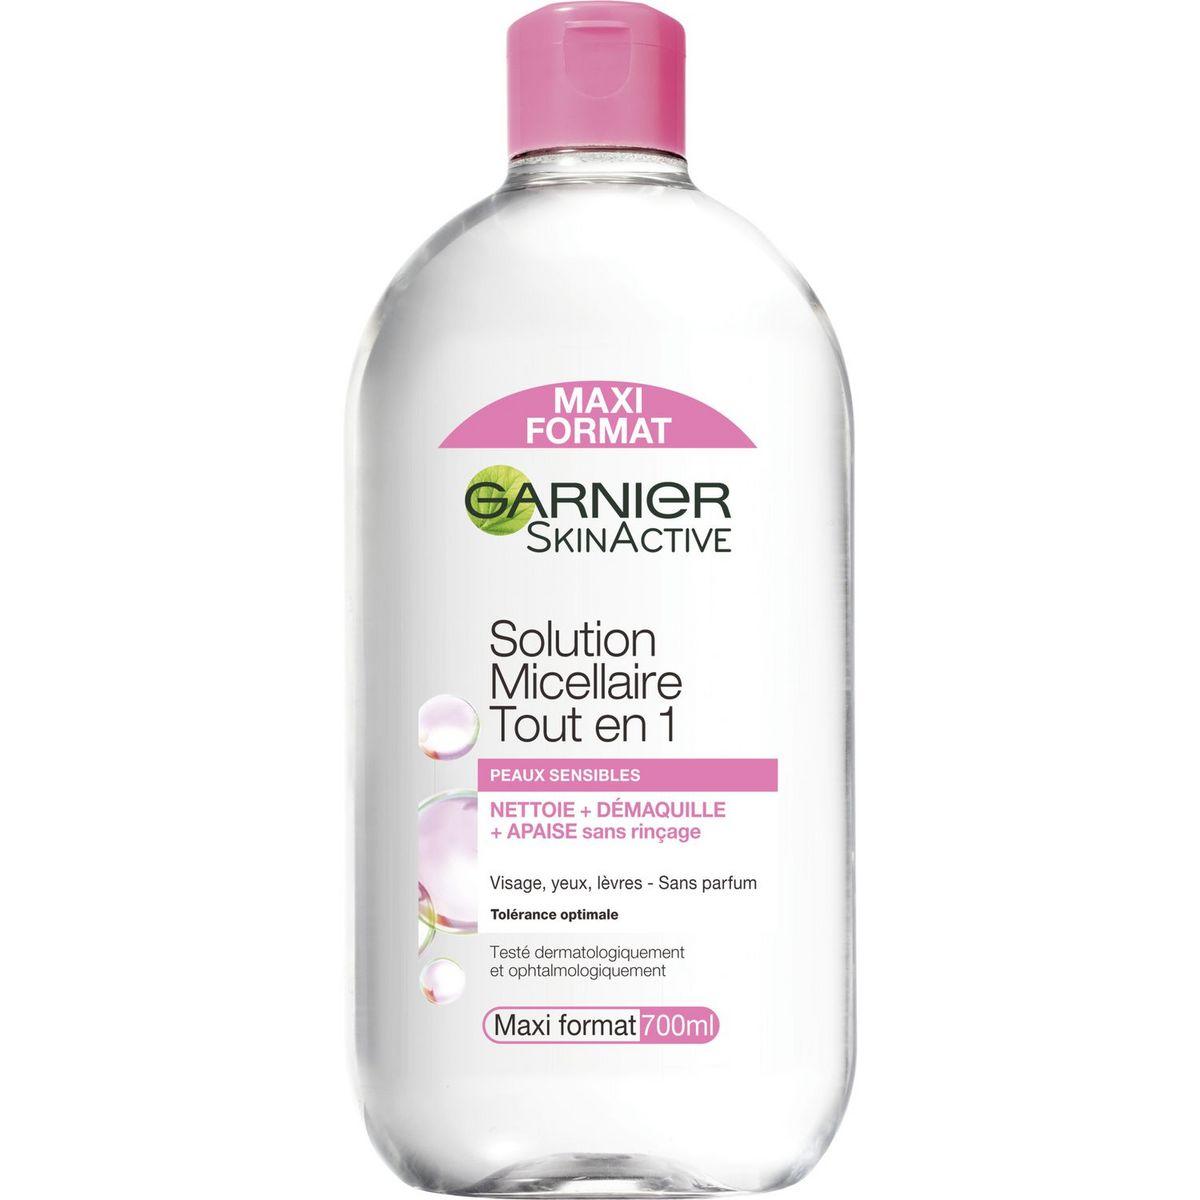 Garnier SkinActive solution micellaire peaux sensibles 700ml